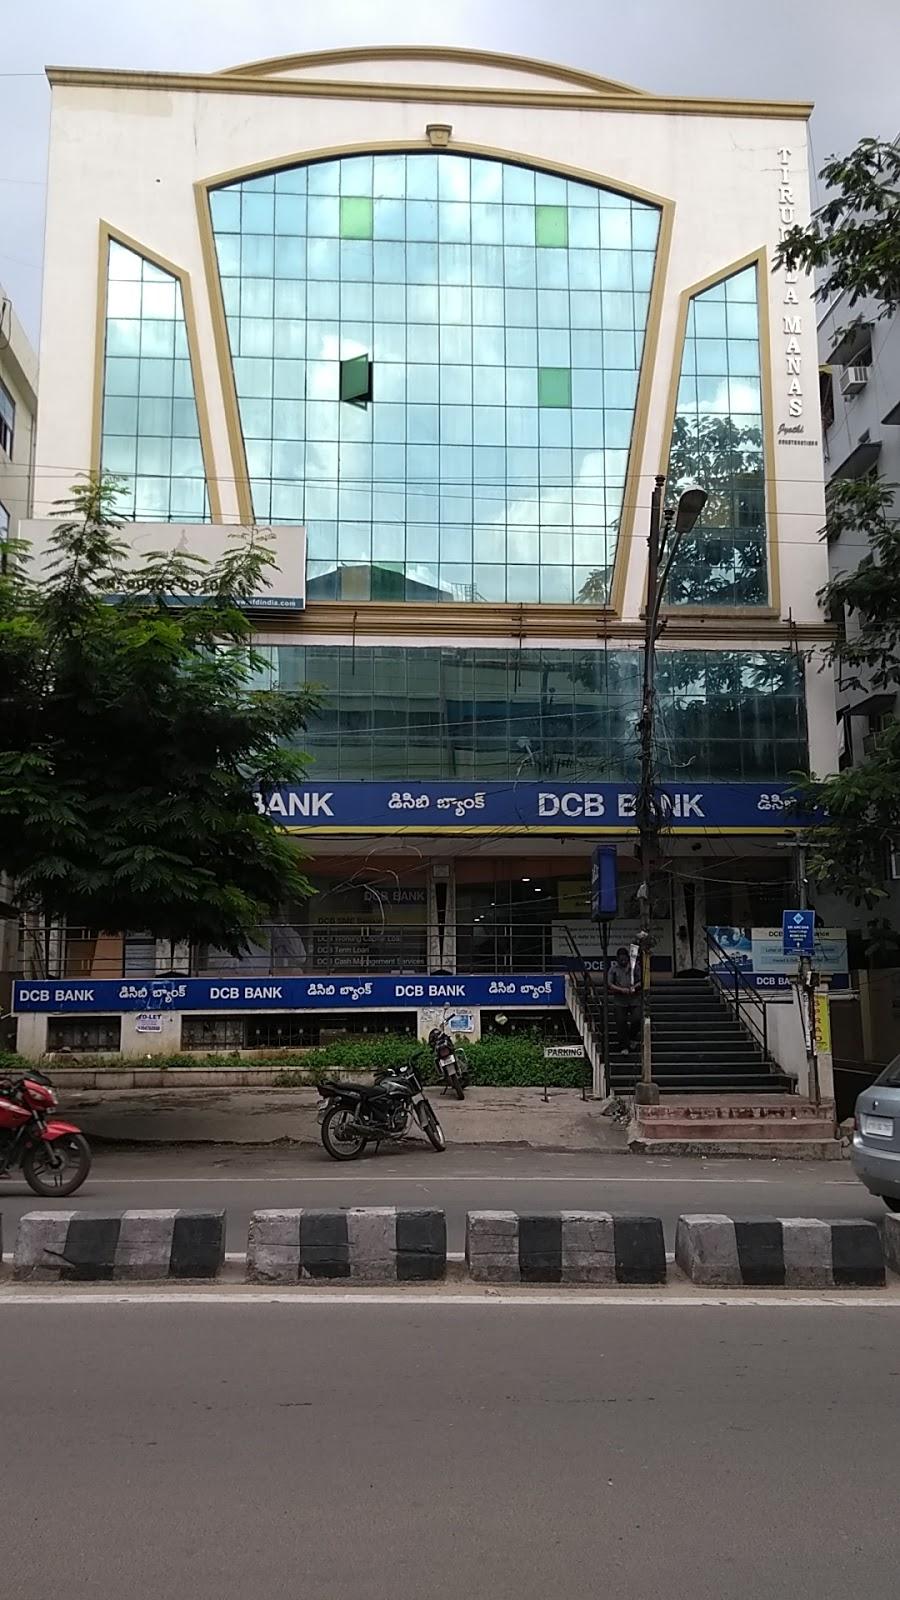 blood bank DCB Bank near Hyderabad Telangana